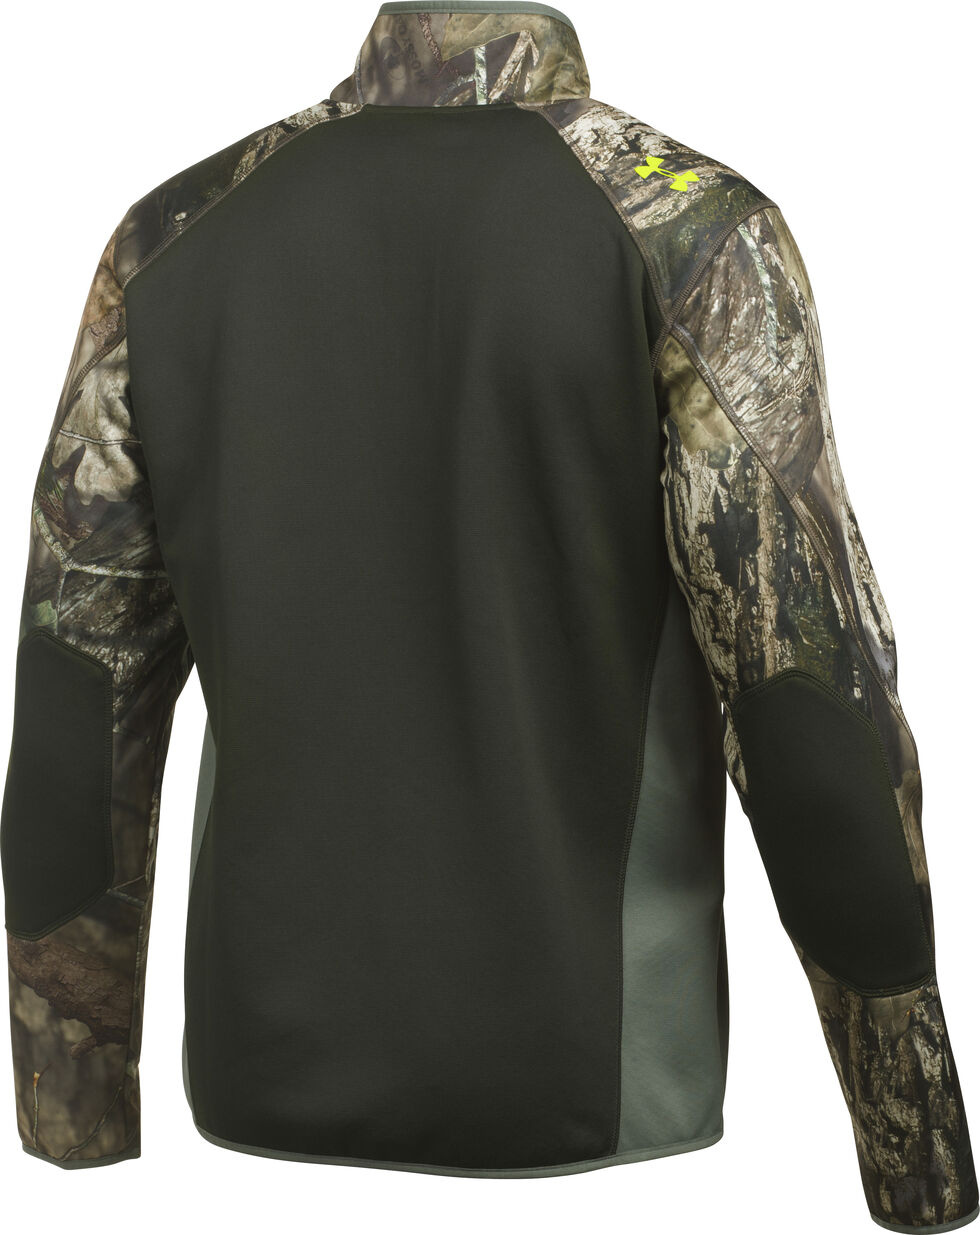 Under Armour Scent Control Armour Fleece Jacket, Mossy Oak, hi-res